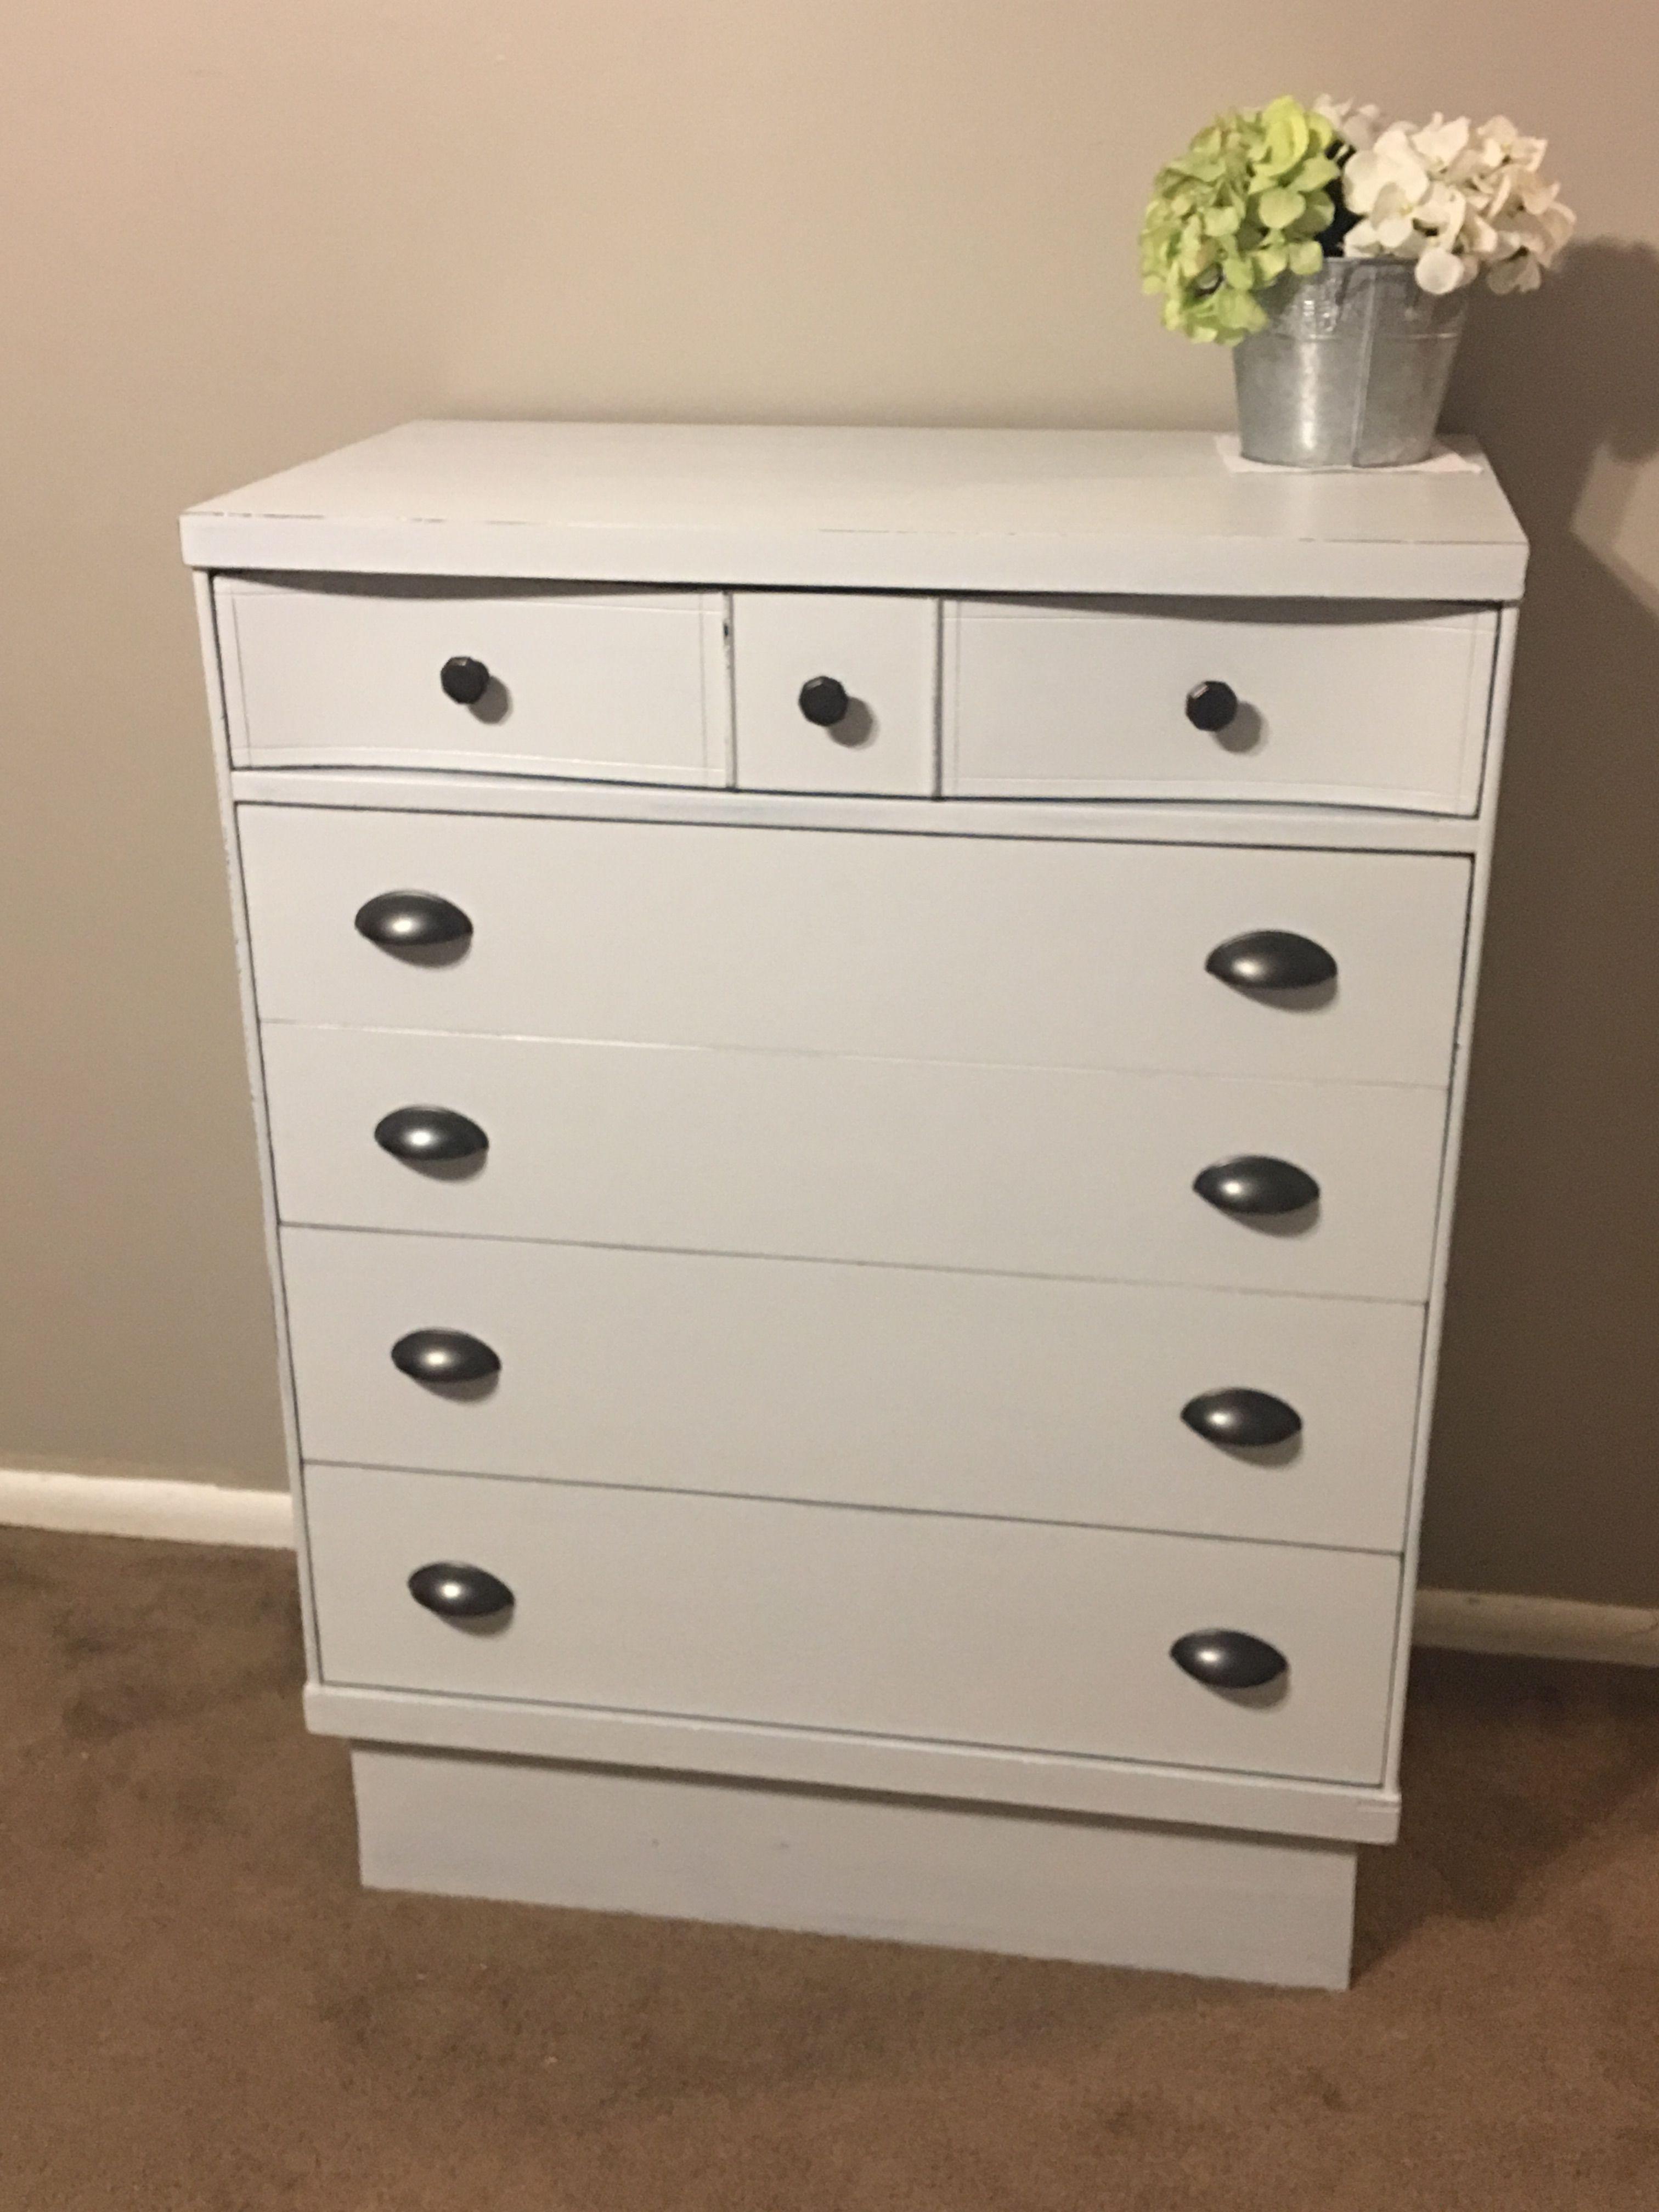 Ultra Light Grey Dresser With Dark Zinc Hardware Redo Furniture Grey Dresser Furniture [ 4032 x 3024 Pixel ]